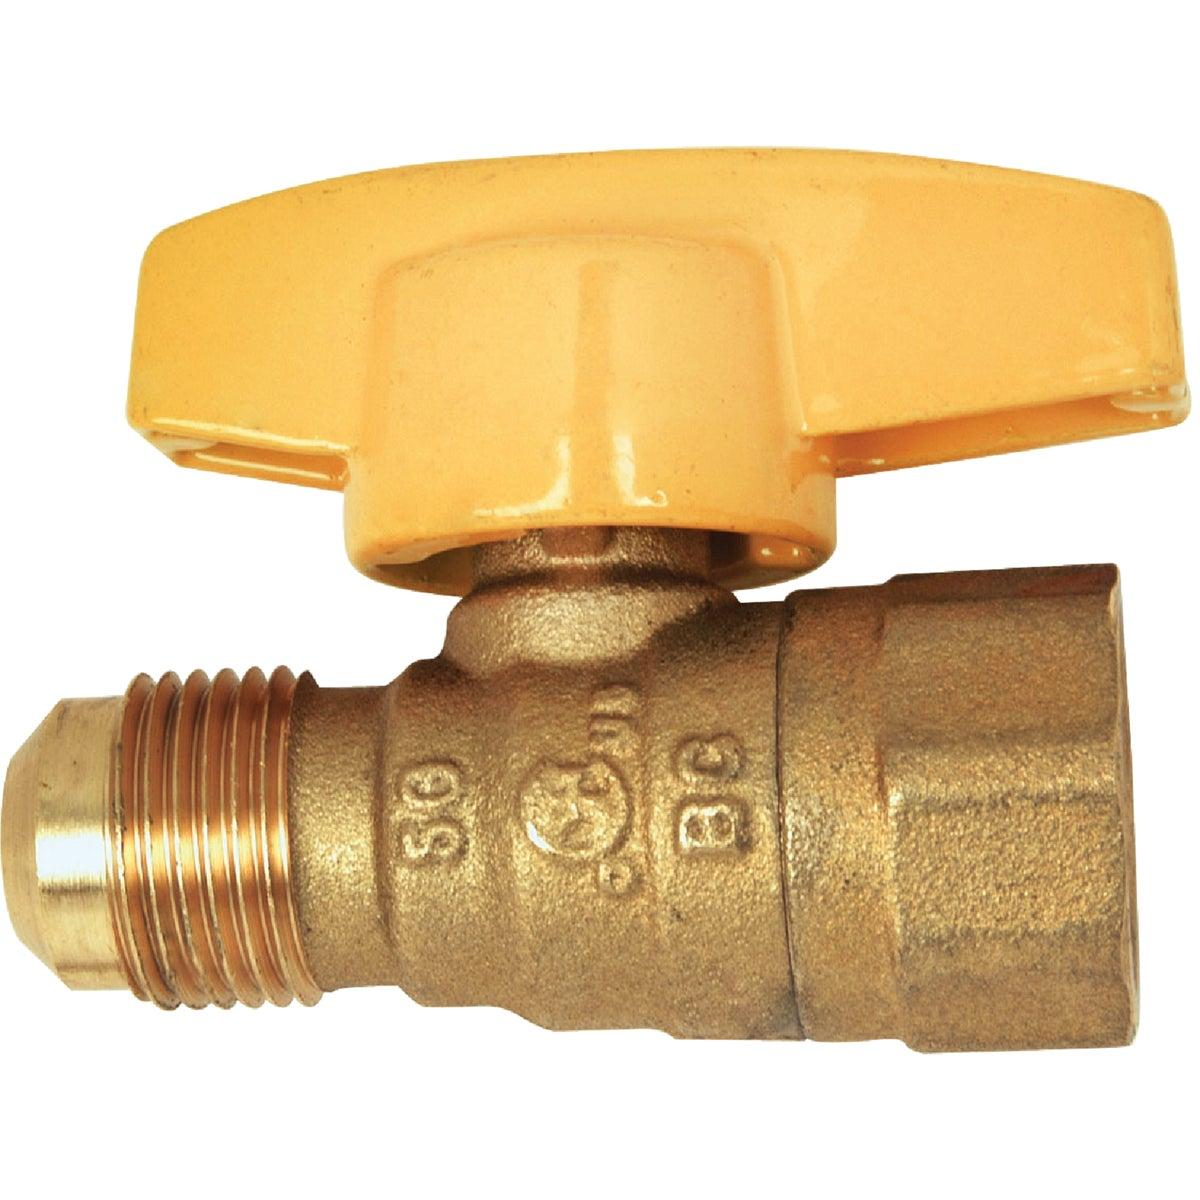 1/2X1/2 GAS VALVE - PSSD-41 by Brass Craft